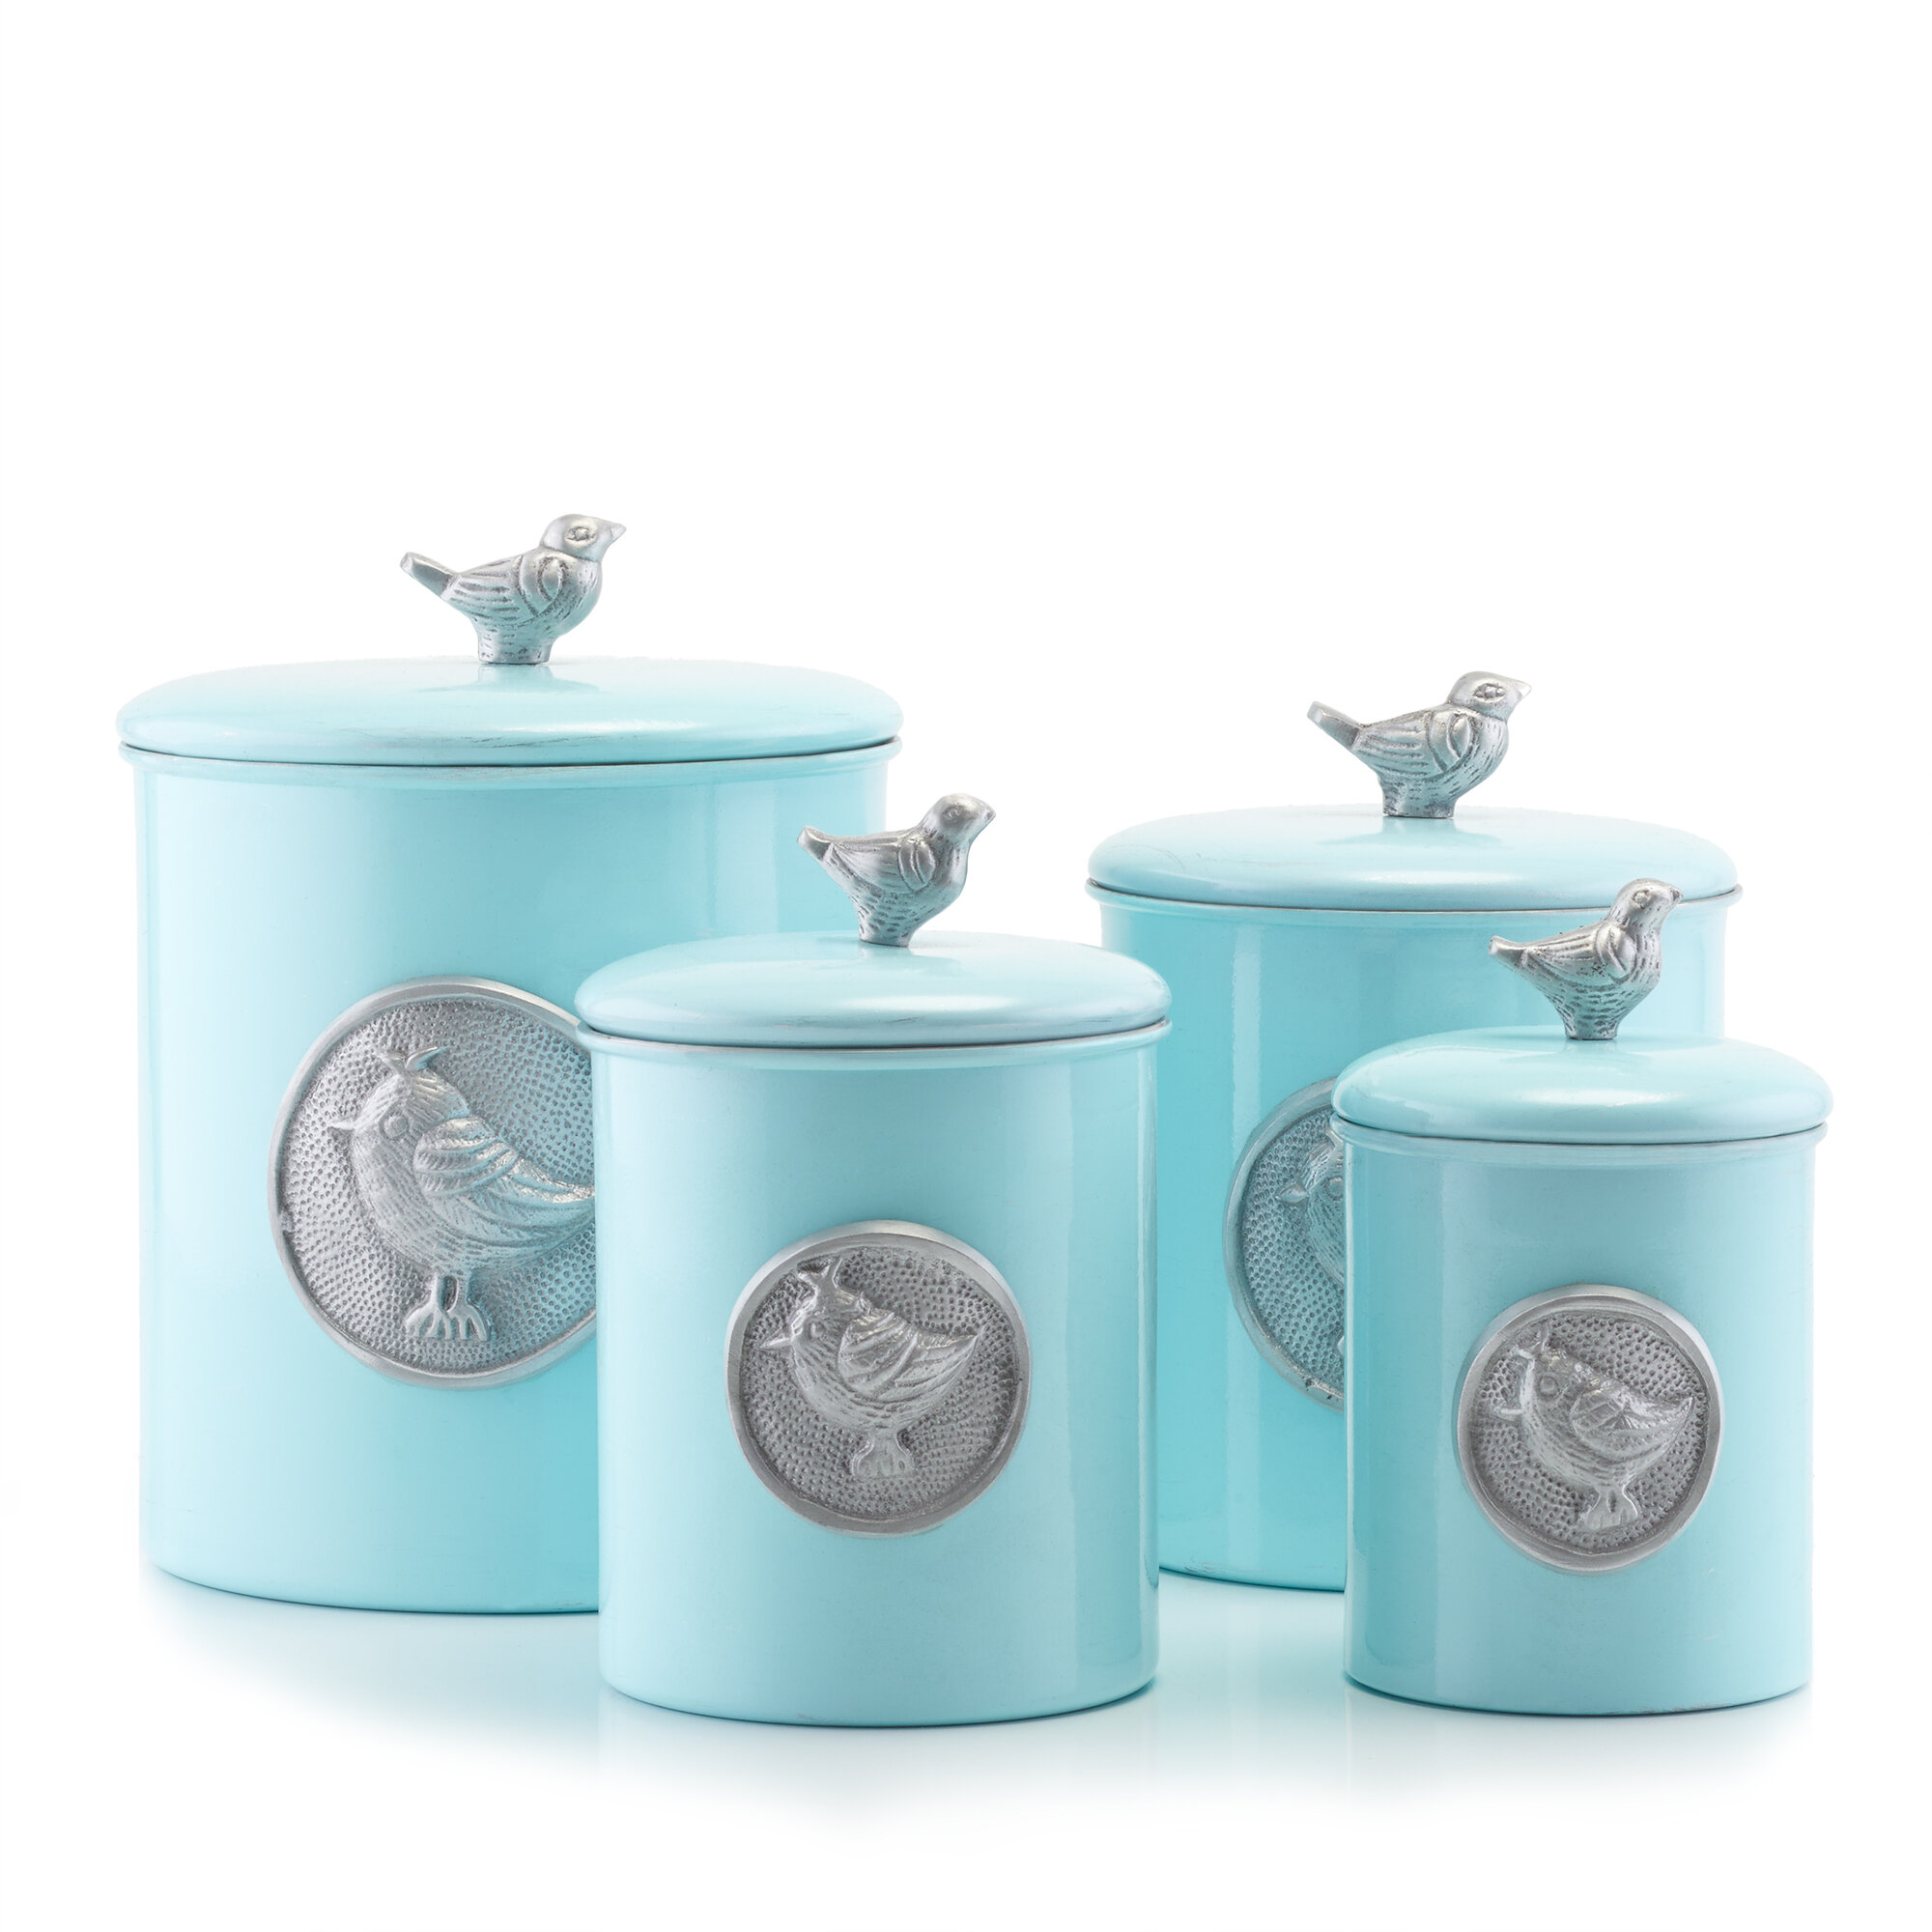 old dutch international lauren bluebird 4 piece kitchen canister set rh ebay com Western Cowboy Kitchen Canister Set Western Cowboy Kitchen Canister Set